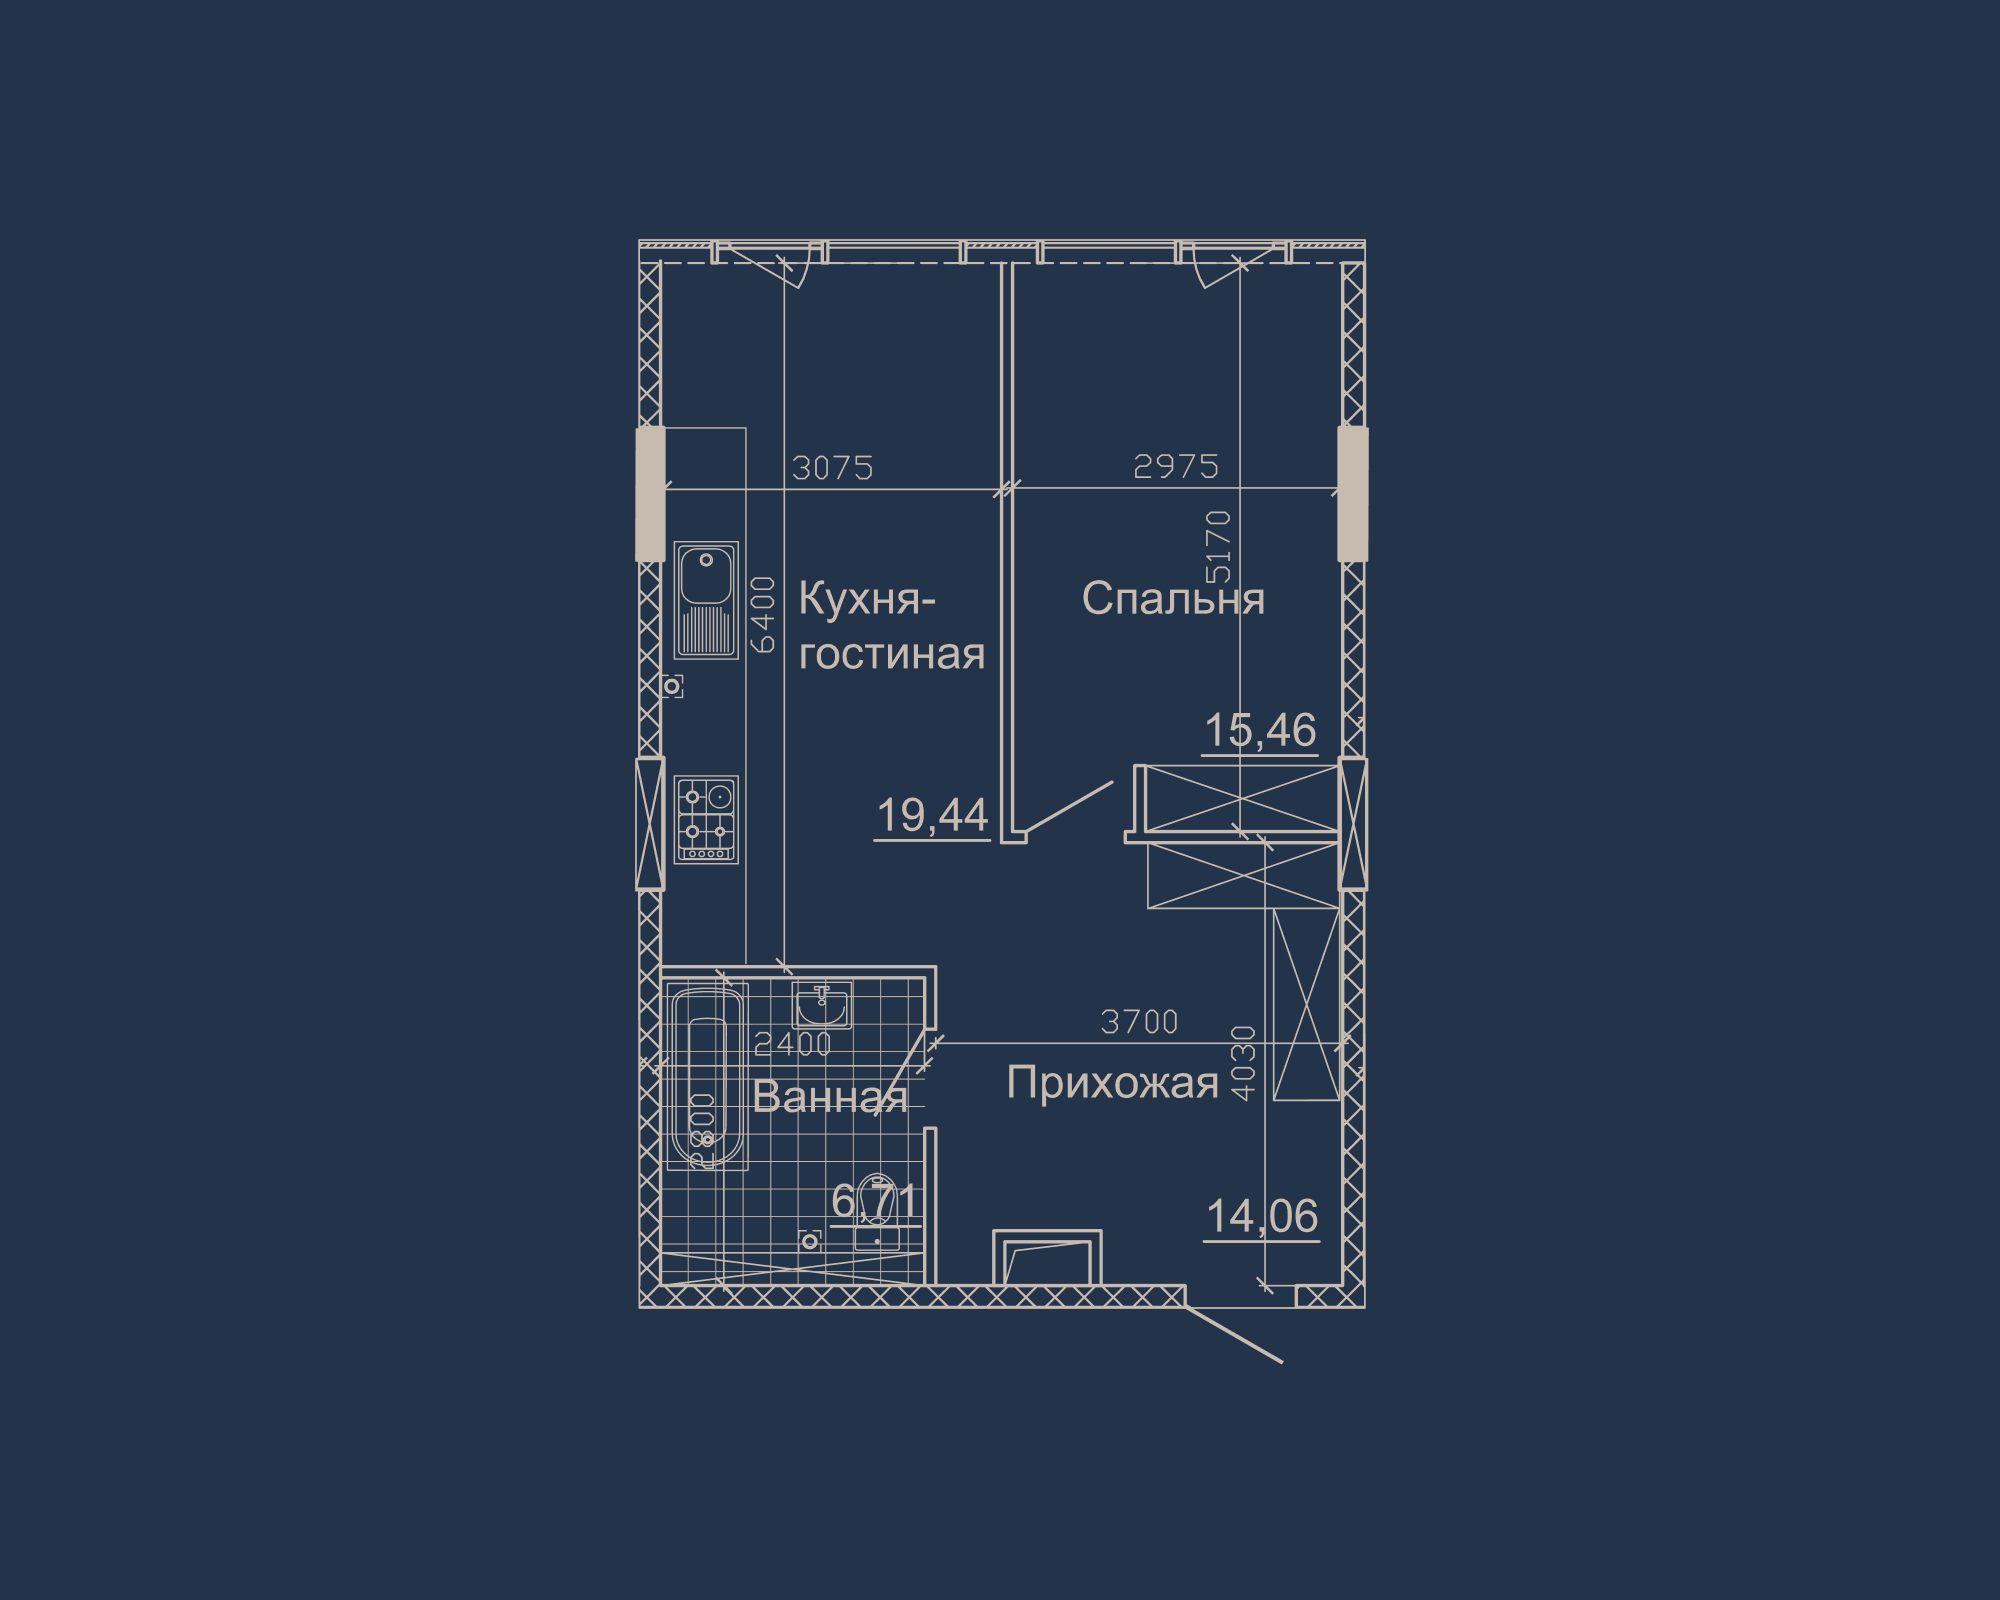 1-кімнатна квартира типу 04А у ЖК Nebo